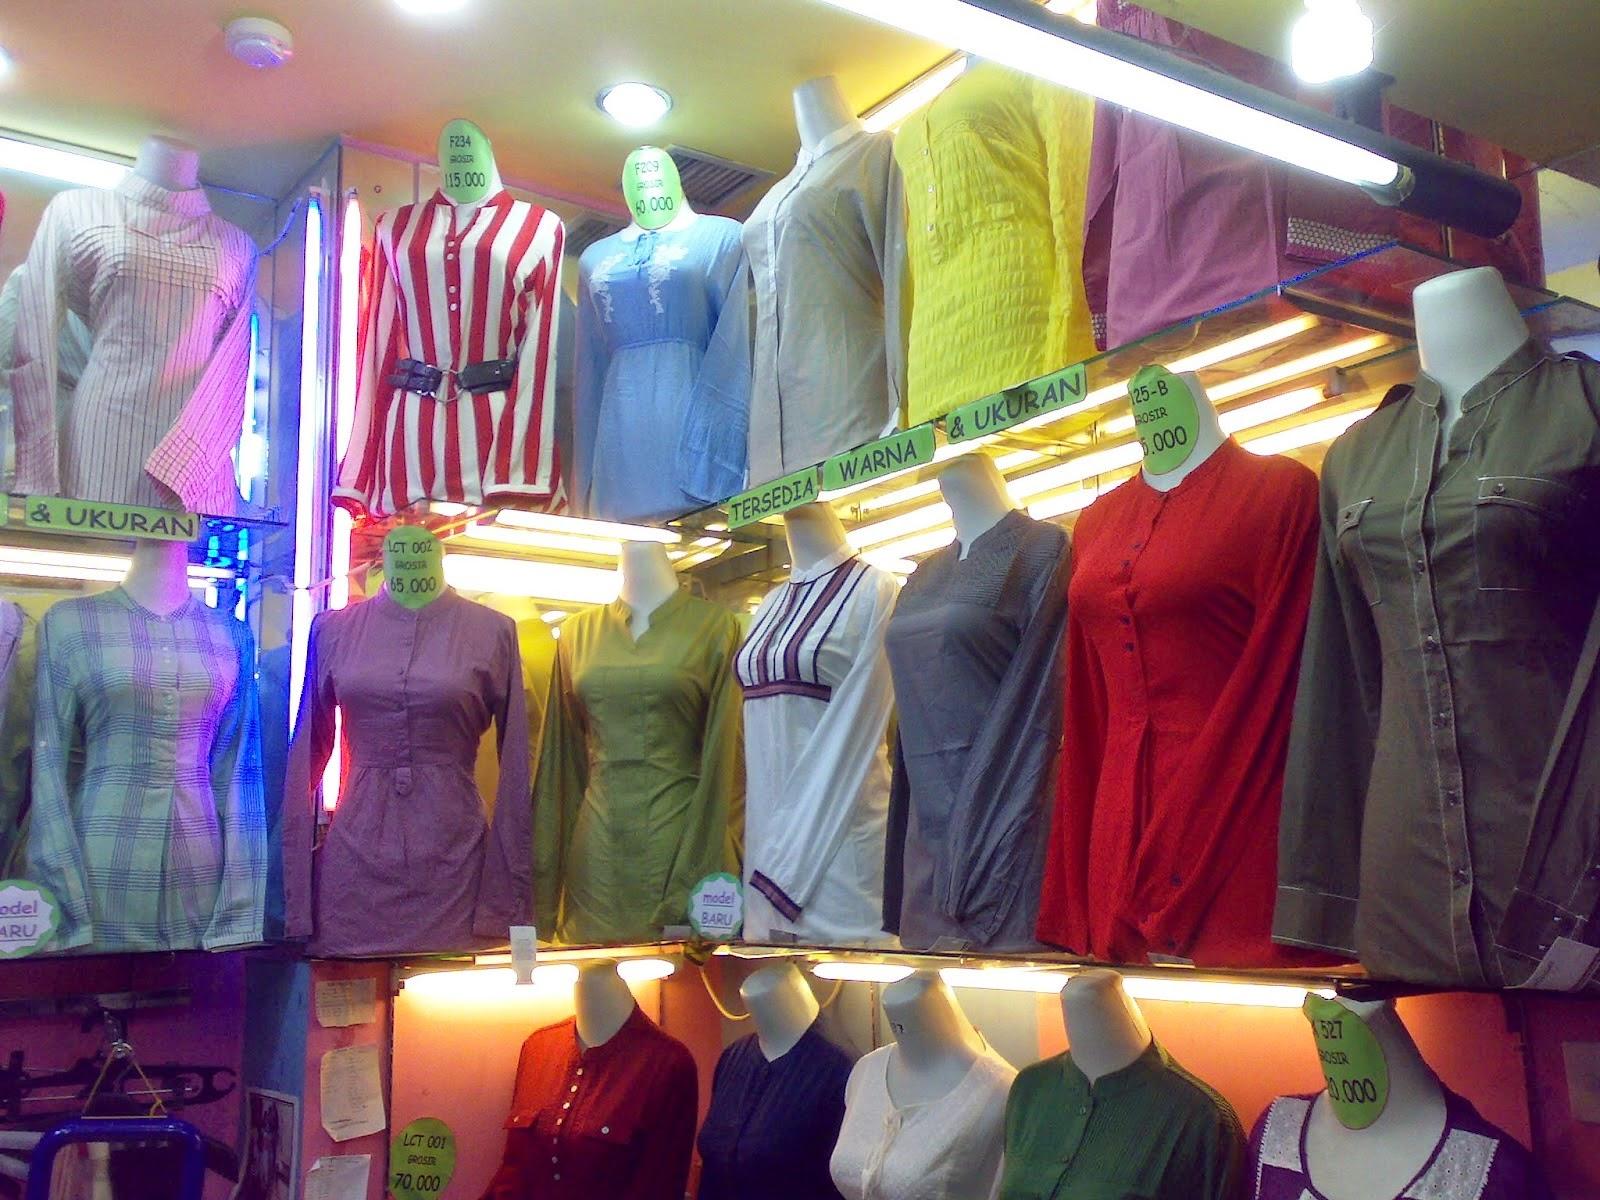 Pusat Grosir Dompet Wanita Di Surabaya